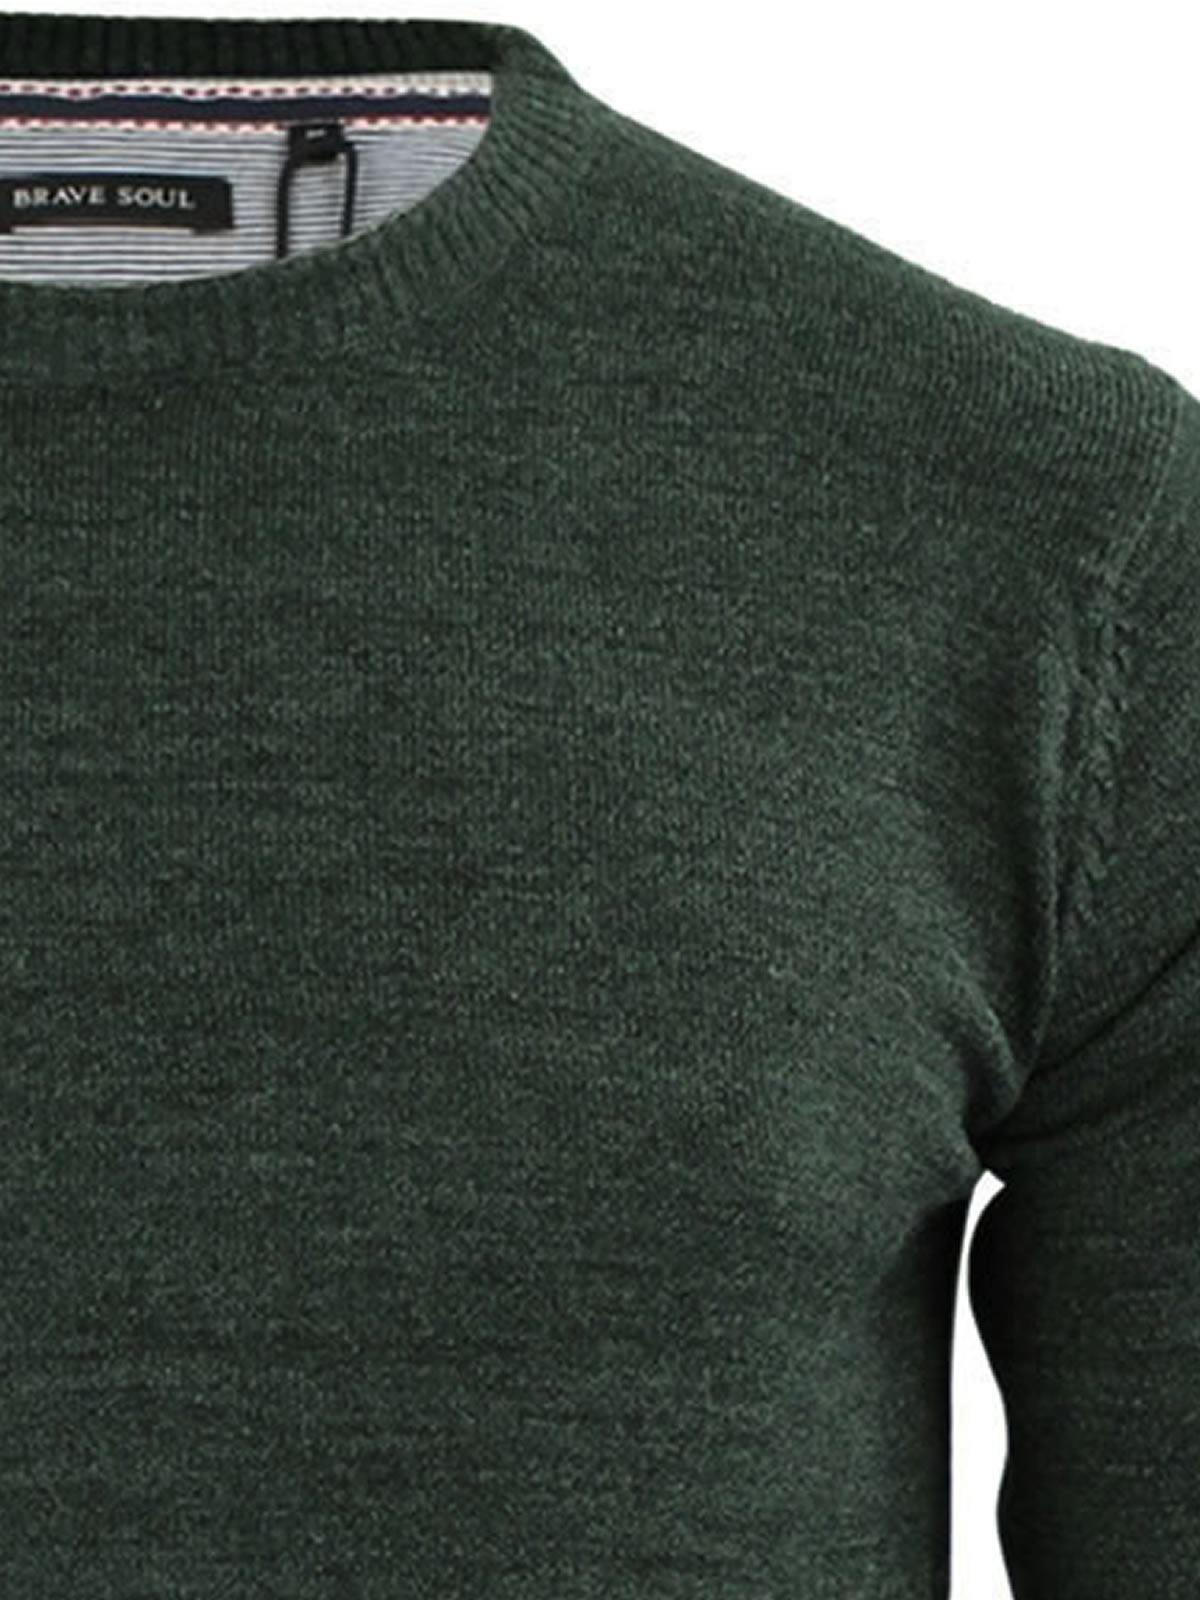 Mens-Jumper-Brave-Soul-Urbain-Knitted-Crew-Neck-Sweater thumbnail 19